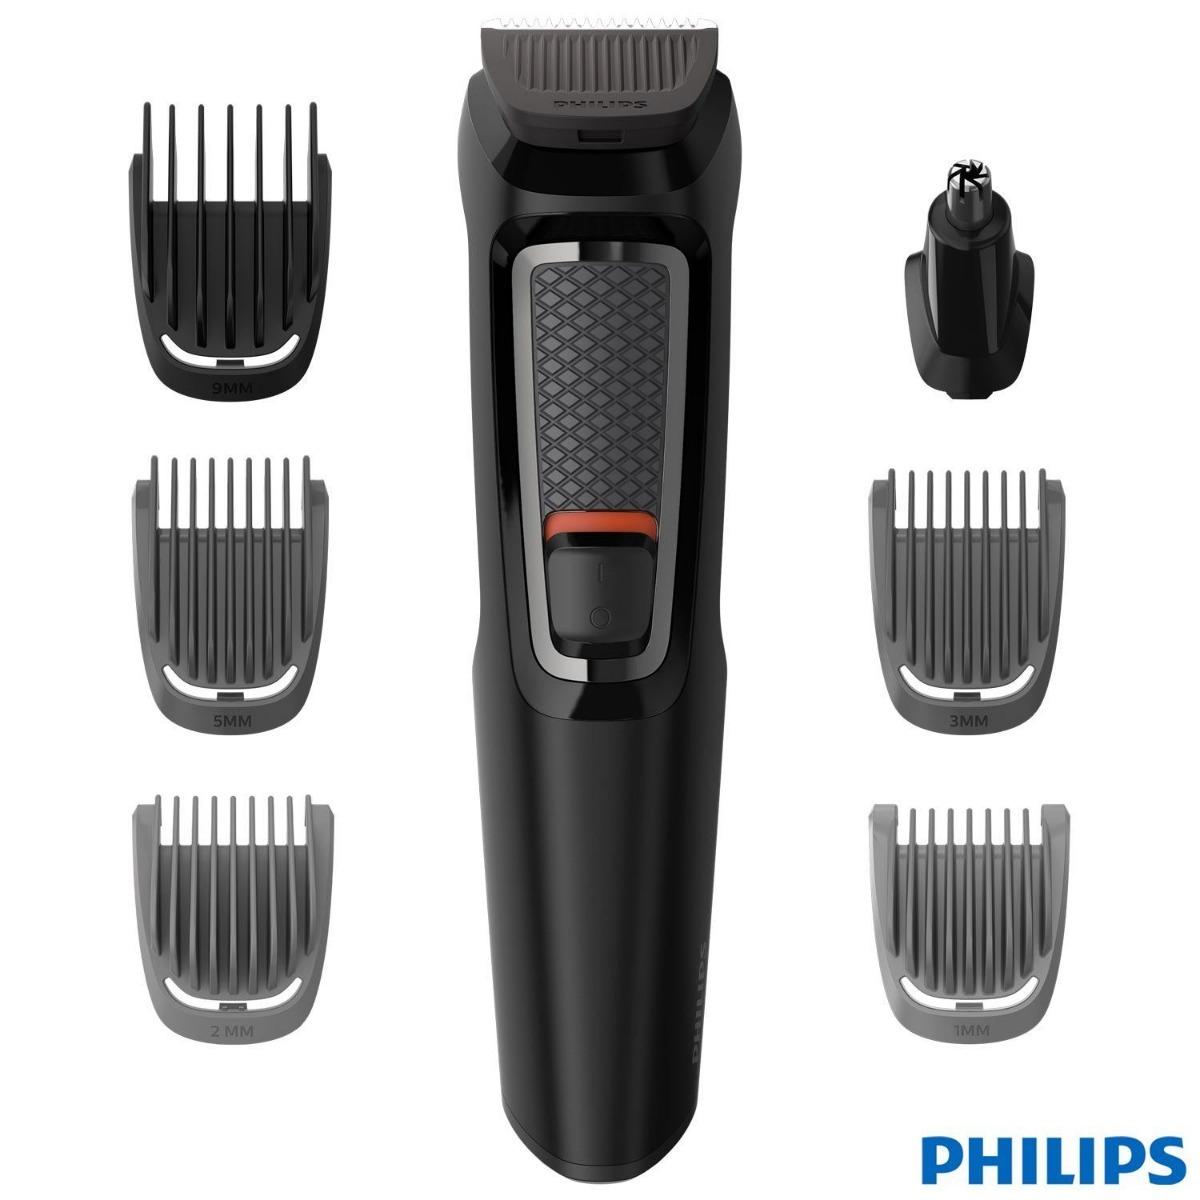 0d8c6f1d2 Aparador Barbeador Elétrico 7em1 Philips Mg3721/15 Bivolt - R$ 169 ...